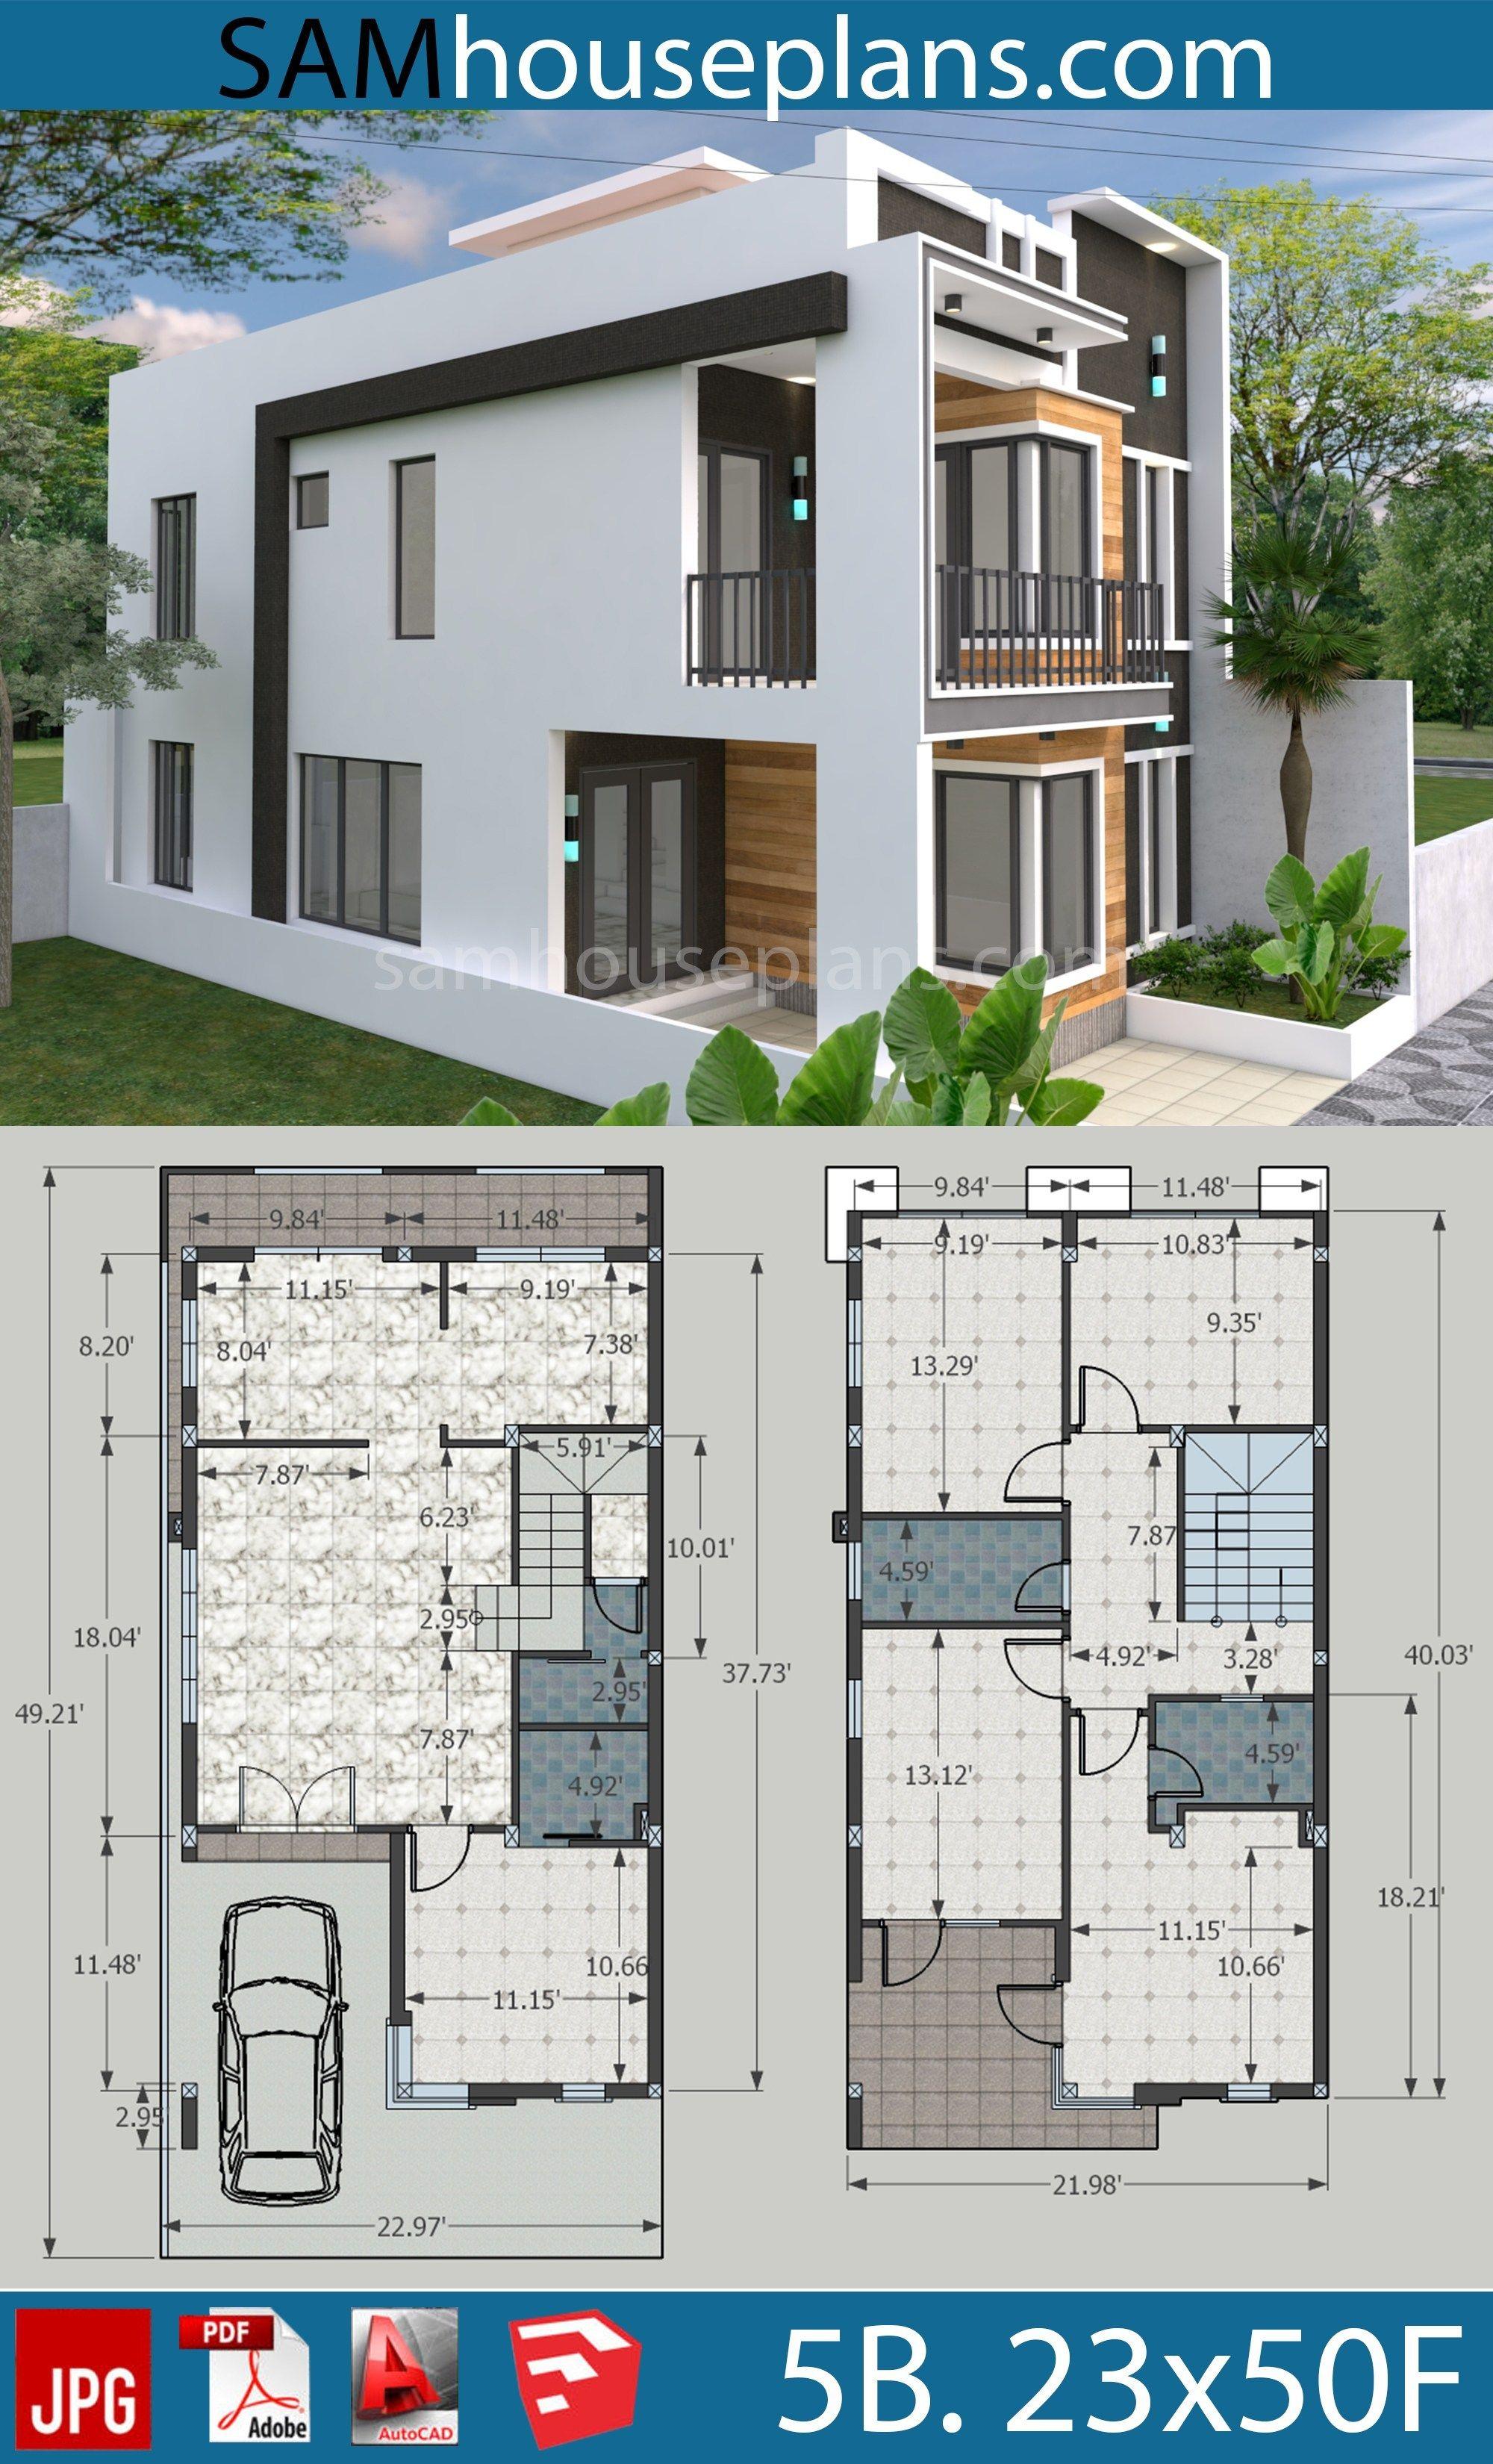 House Plans 7x15m With 4 Bedrooms Sam House Plans Model House Plan Duplex House Design Architectural House Plans